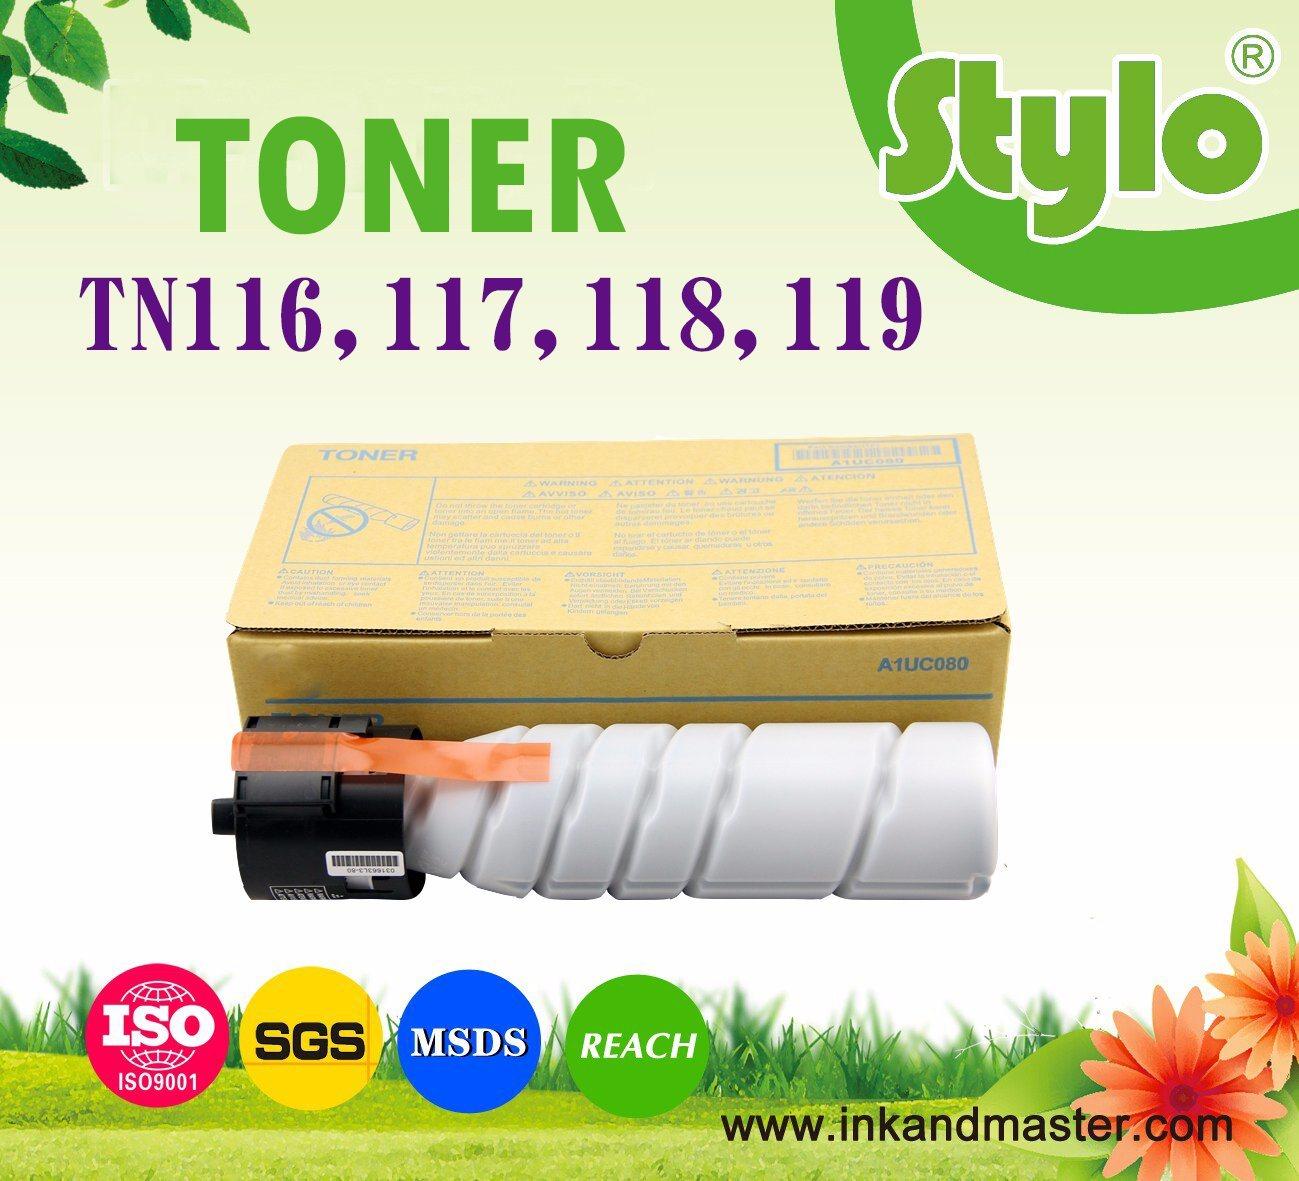 Tn-118 Tn-119 Printer Toner Cartridge